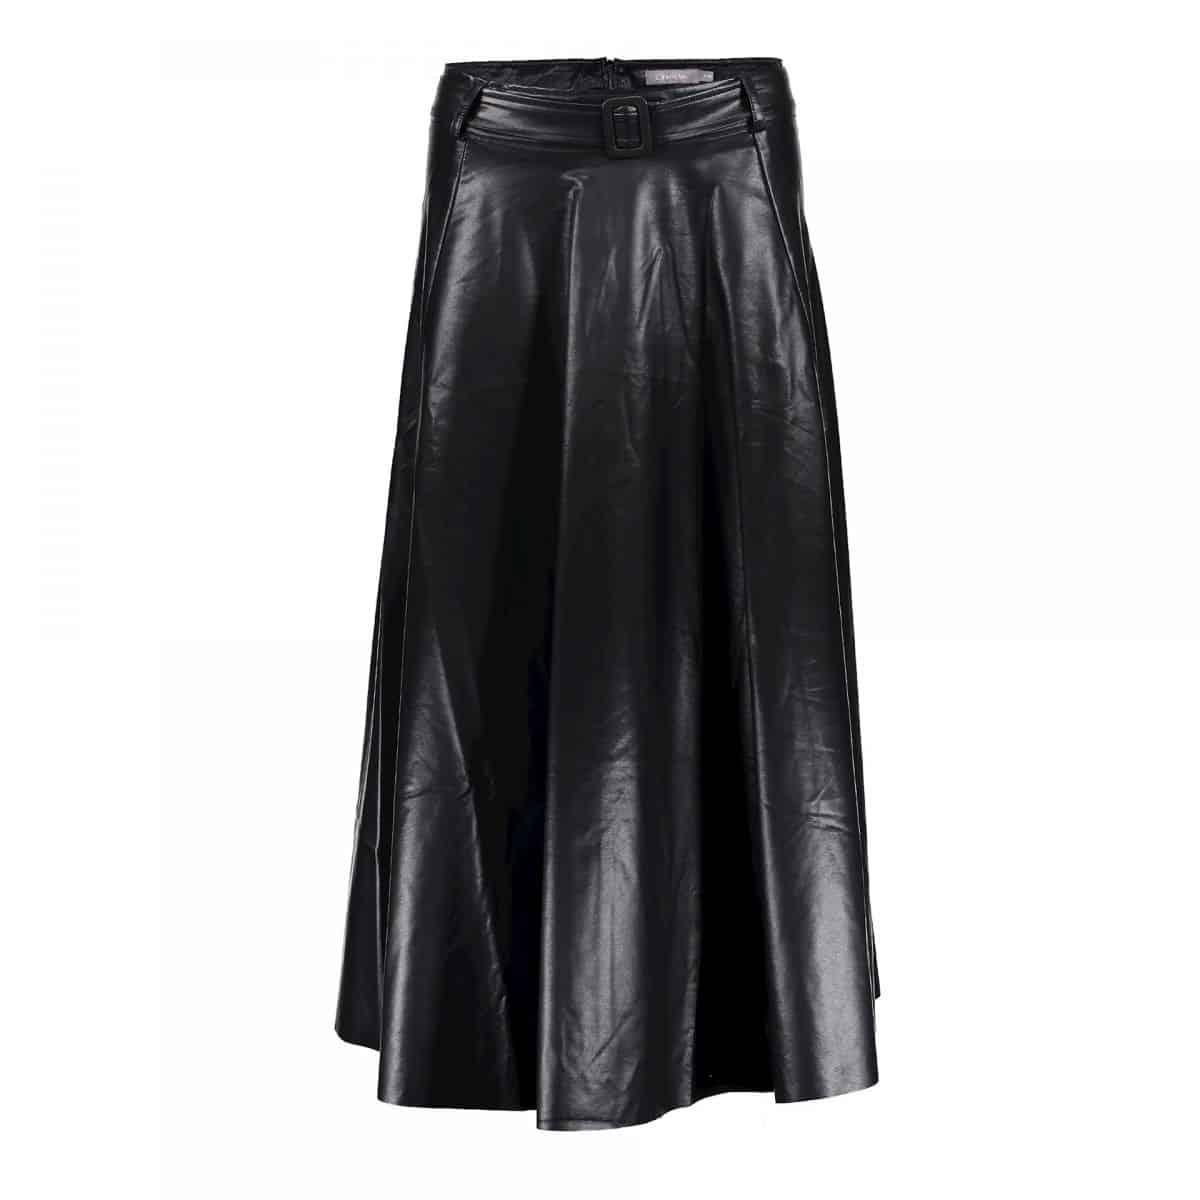 Geisha Skirt PU With Strap At Waist Black